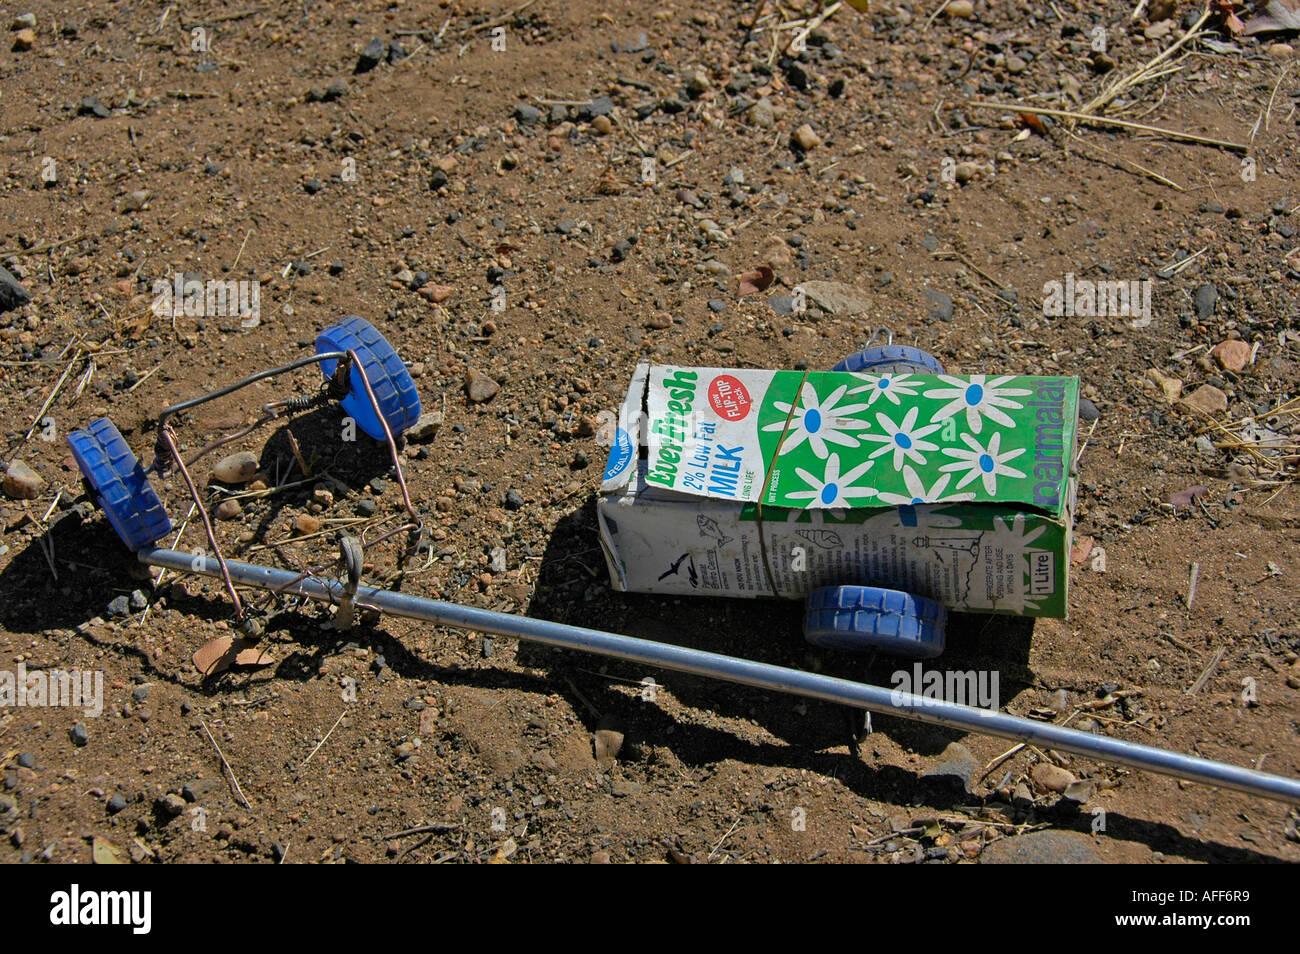 Toys From Africa : Africa entrepeneurship toys outdoor friedrich von horsten hand made